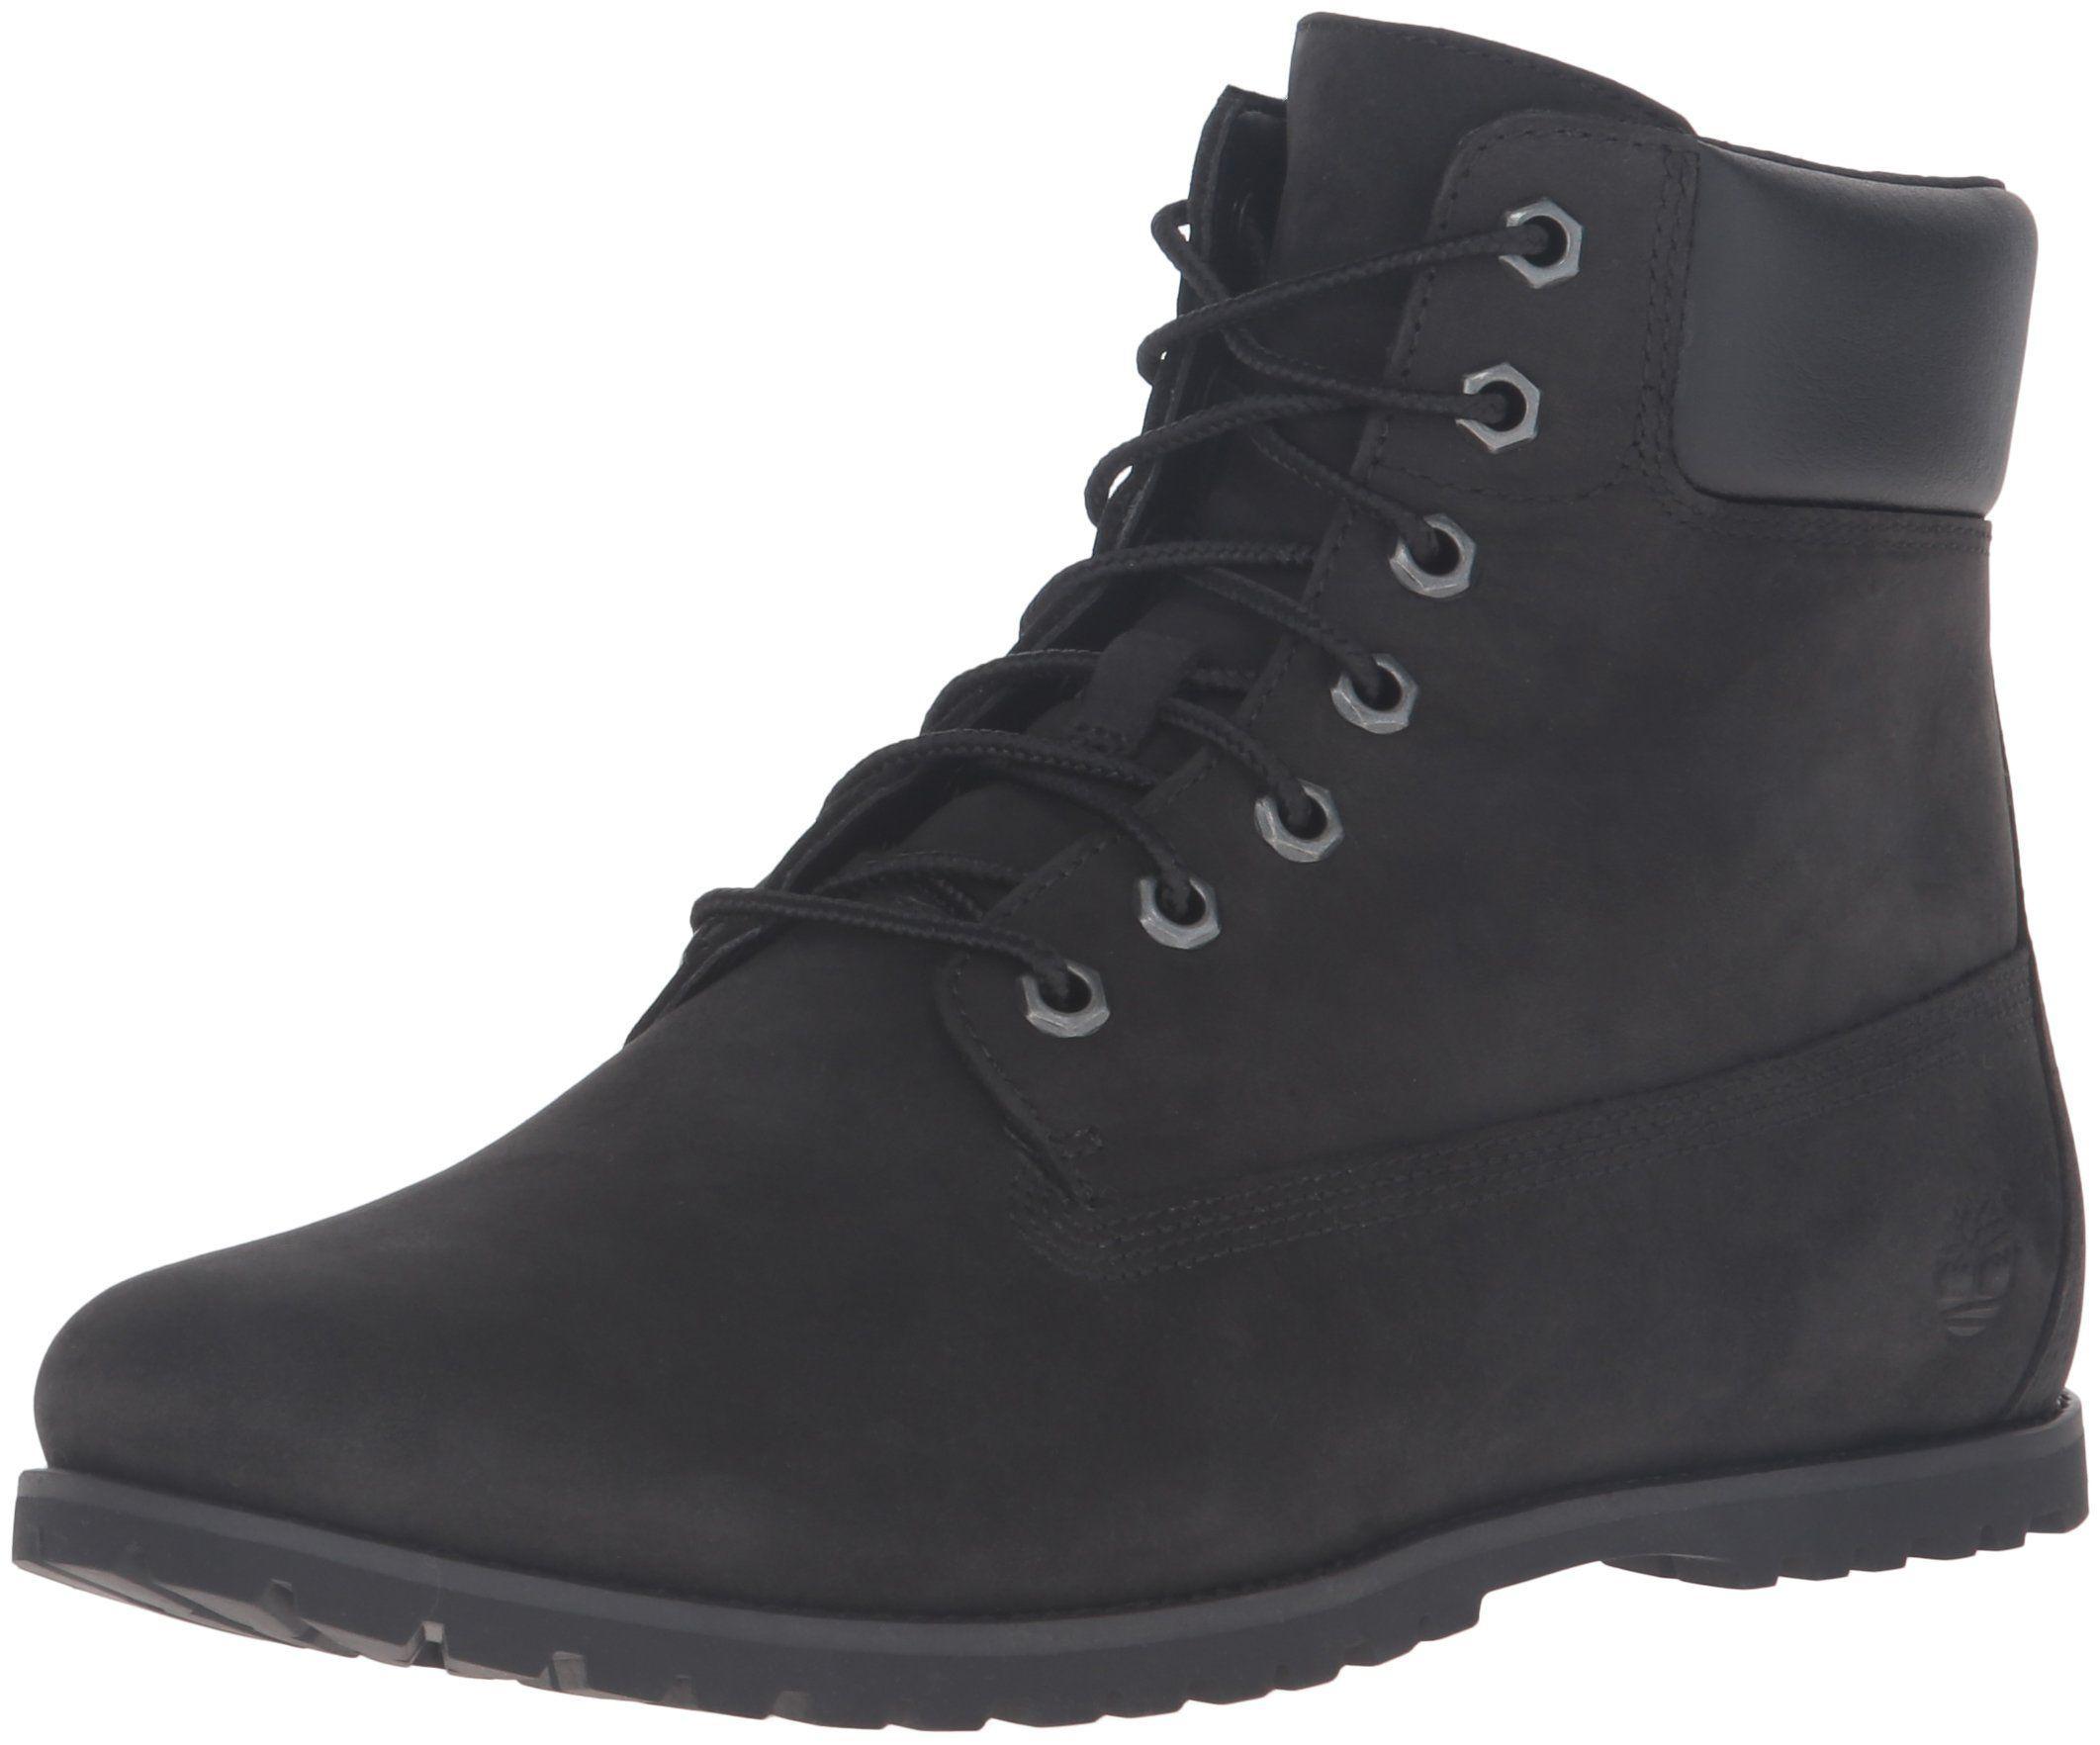 Timberland Women s Joslin 6 Inch Chukka Boot, Black Nubuck Black Collar, 6  M US. Made in USA or Imported. f64a7c31bb